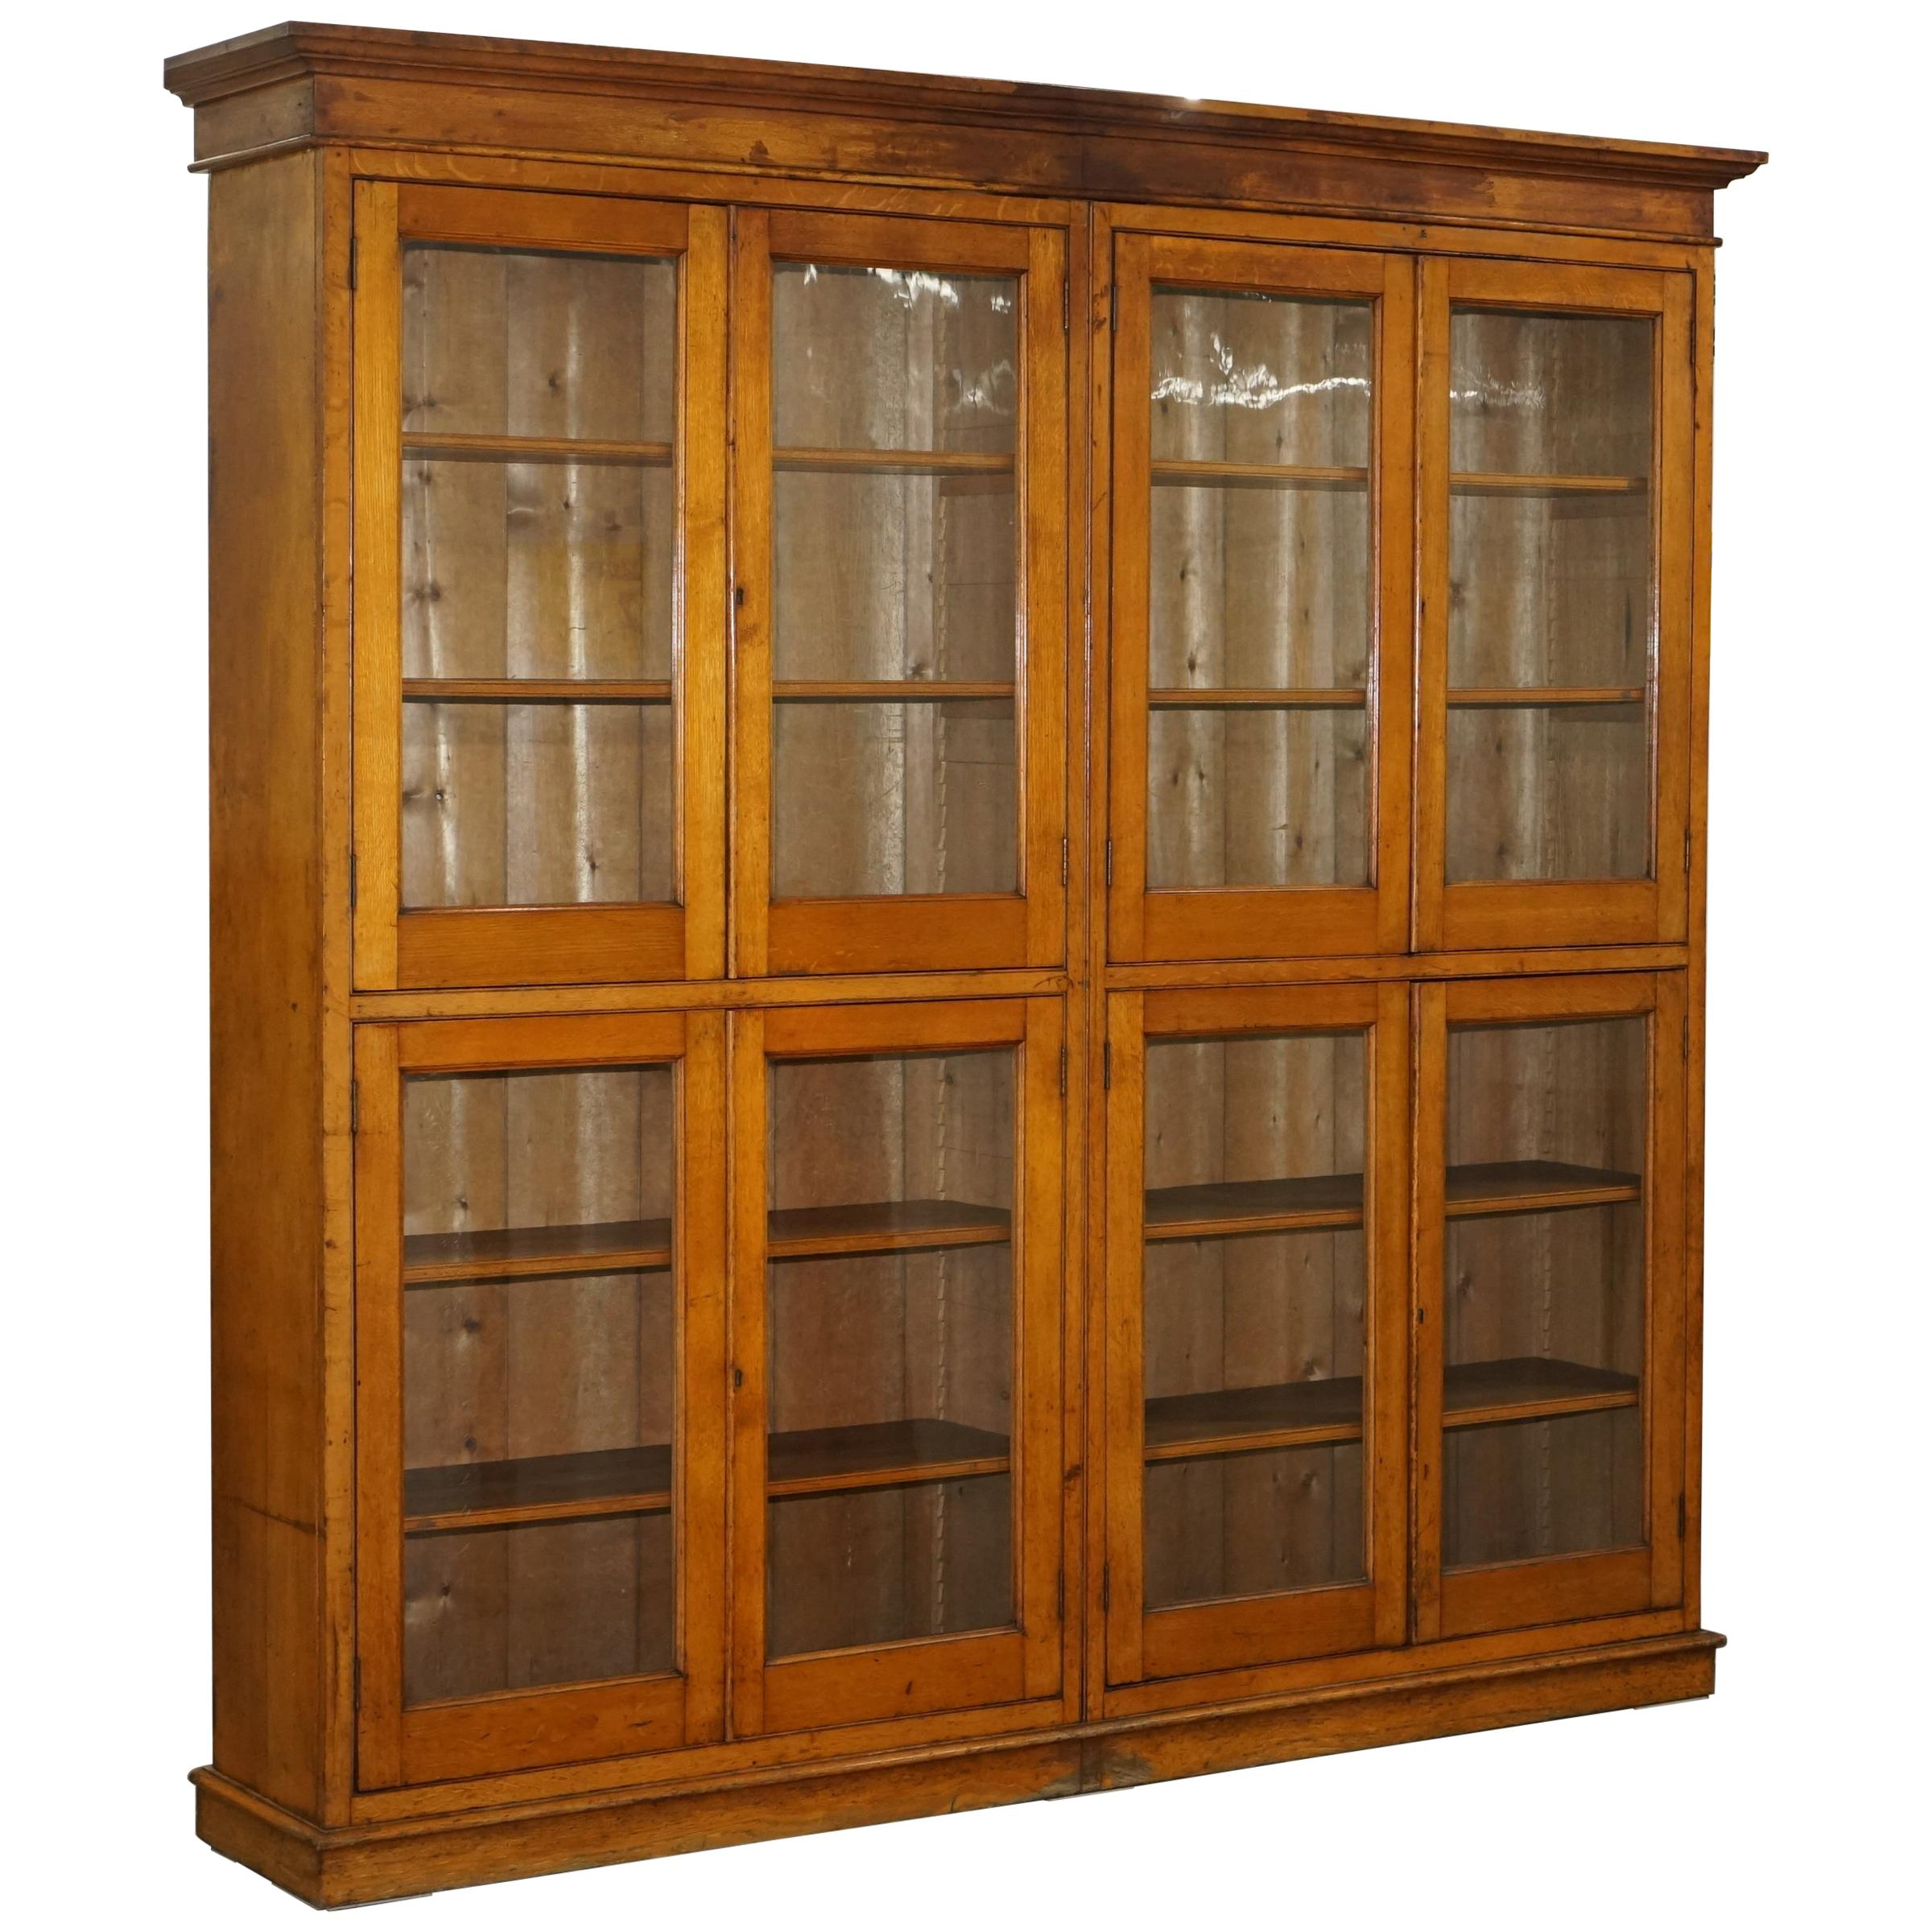 Ordinaire Victorian Mahogany U0026 Oak Library Bookcase Cabinet Adjustable Shelves Glass  Doors